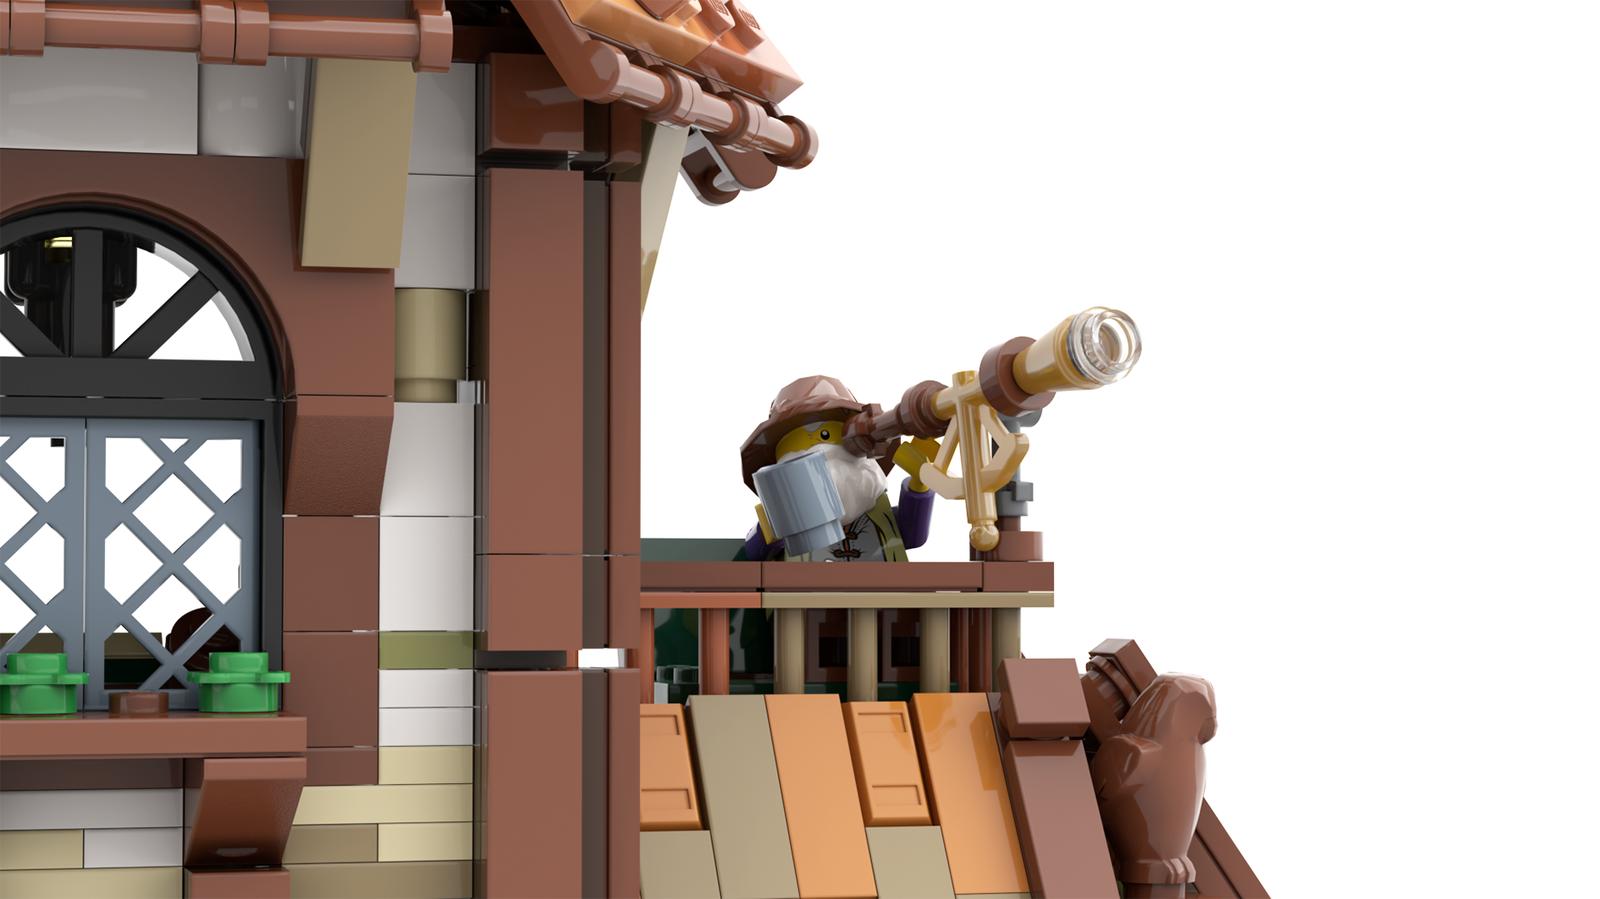 lego-ideas-the-mountain-windmill-hanwasyellowfirst-6 zusammengebaut.com